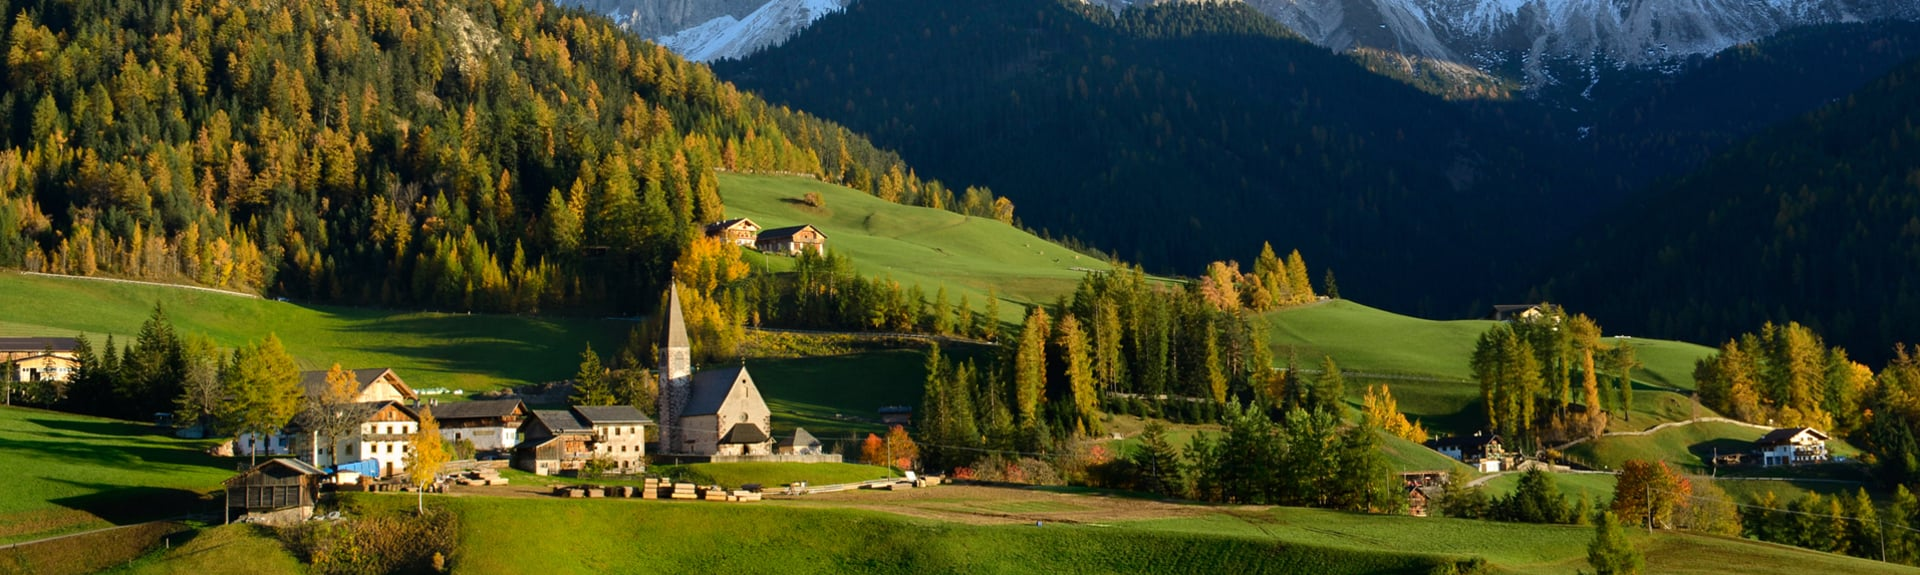 Trentino alto adige agriturismo in italia agriturist for Arredamento trentino alto adige